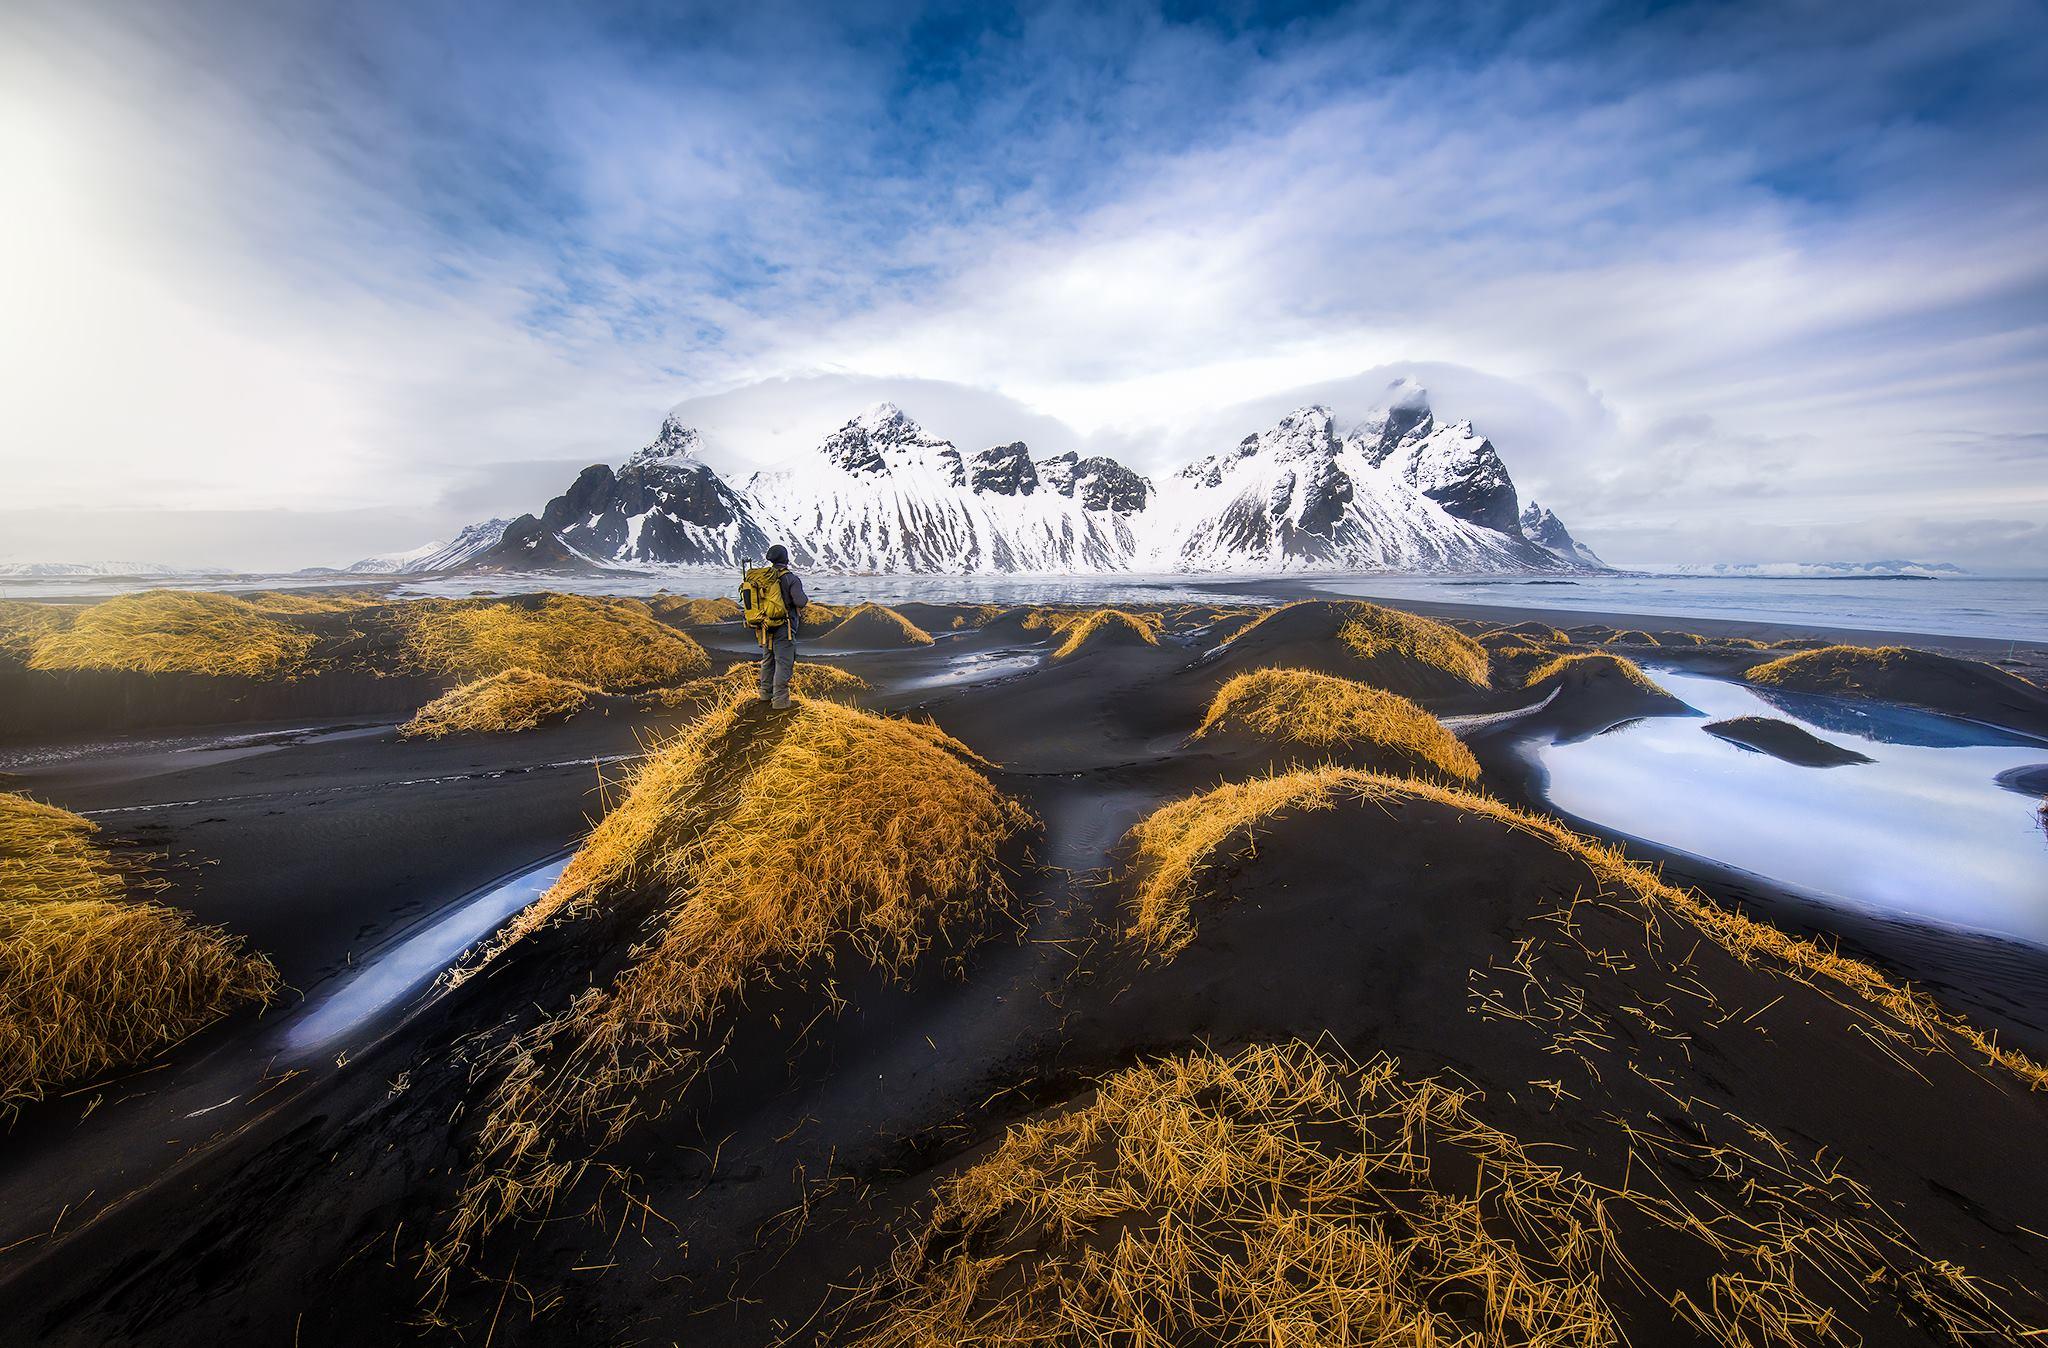 Nature Wallpaper Full Hd National Geographic Winter Dream Photo Tours Iceland Di Fruscia Fine Art